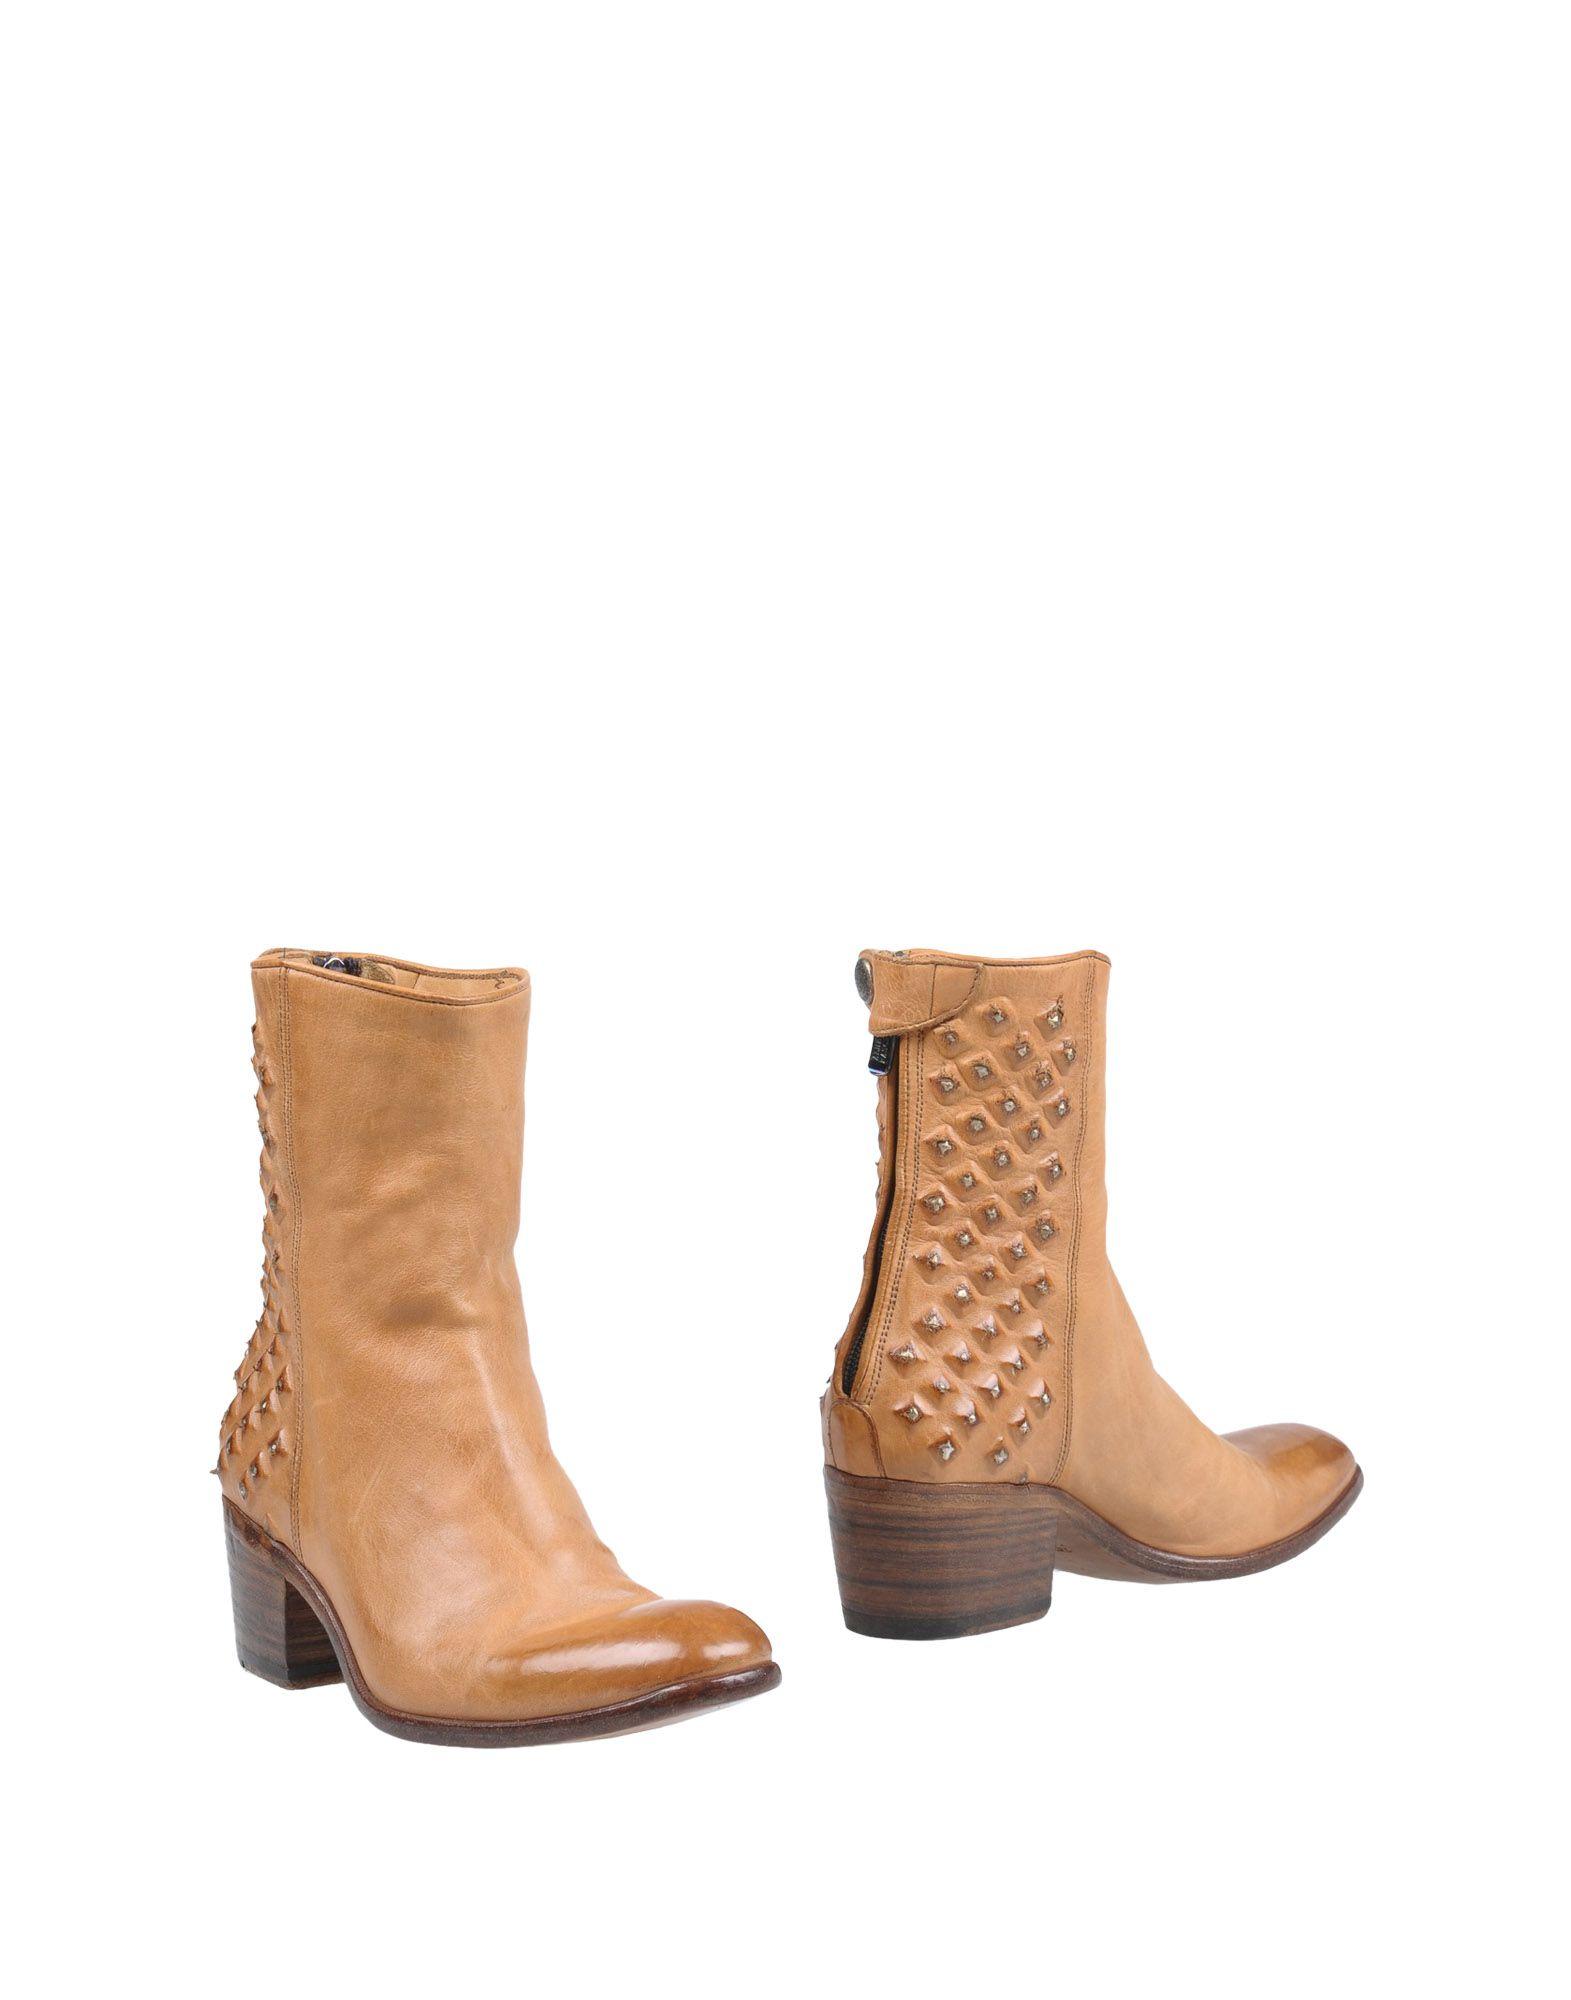 Alberto Damen Fasciani Stiefelette Damen Alberto  11027098XX Neue Schuhe cddfd2